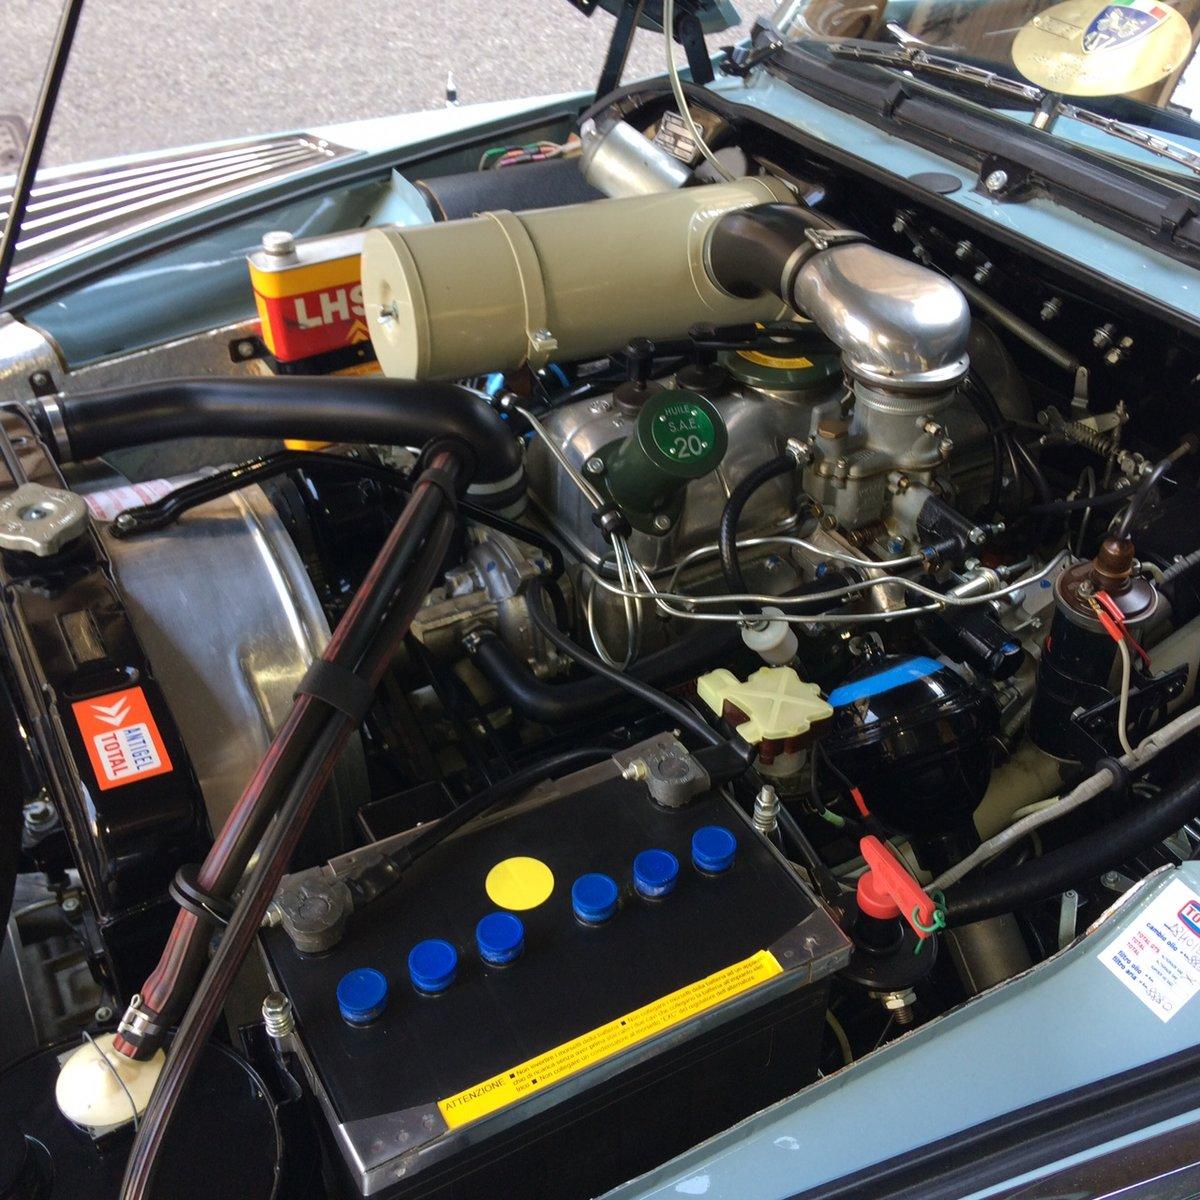 1960 Citroen ds 19 cabriolet le caddy chapron For Sale (picture 6 of 6)